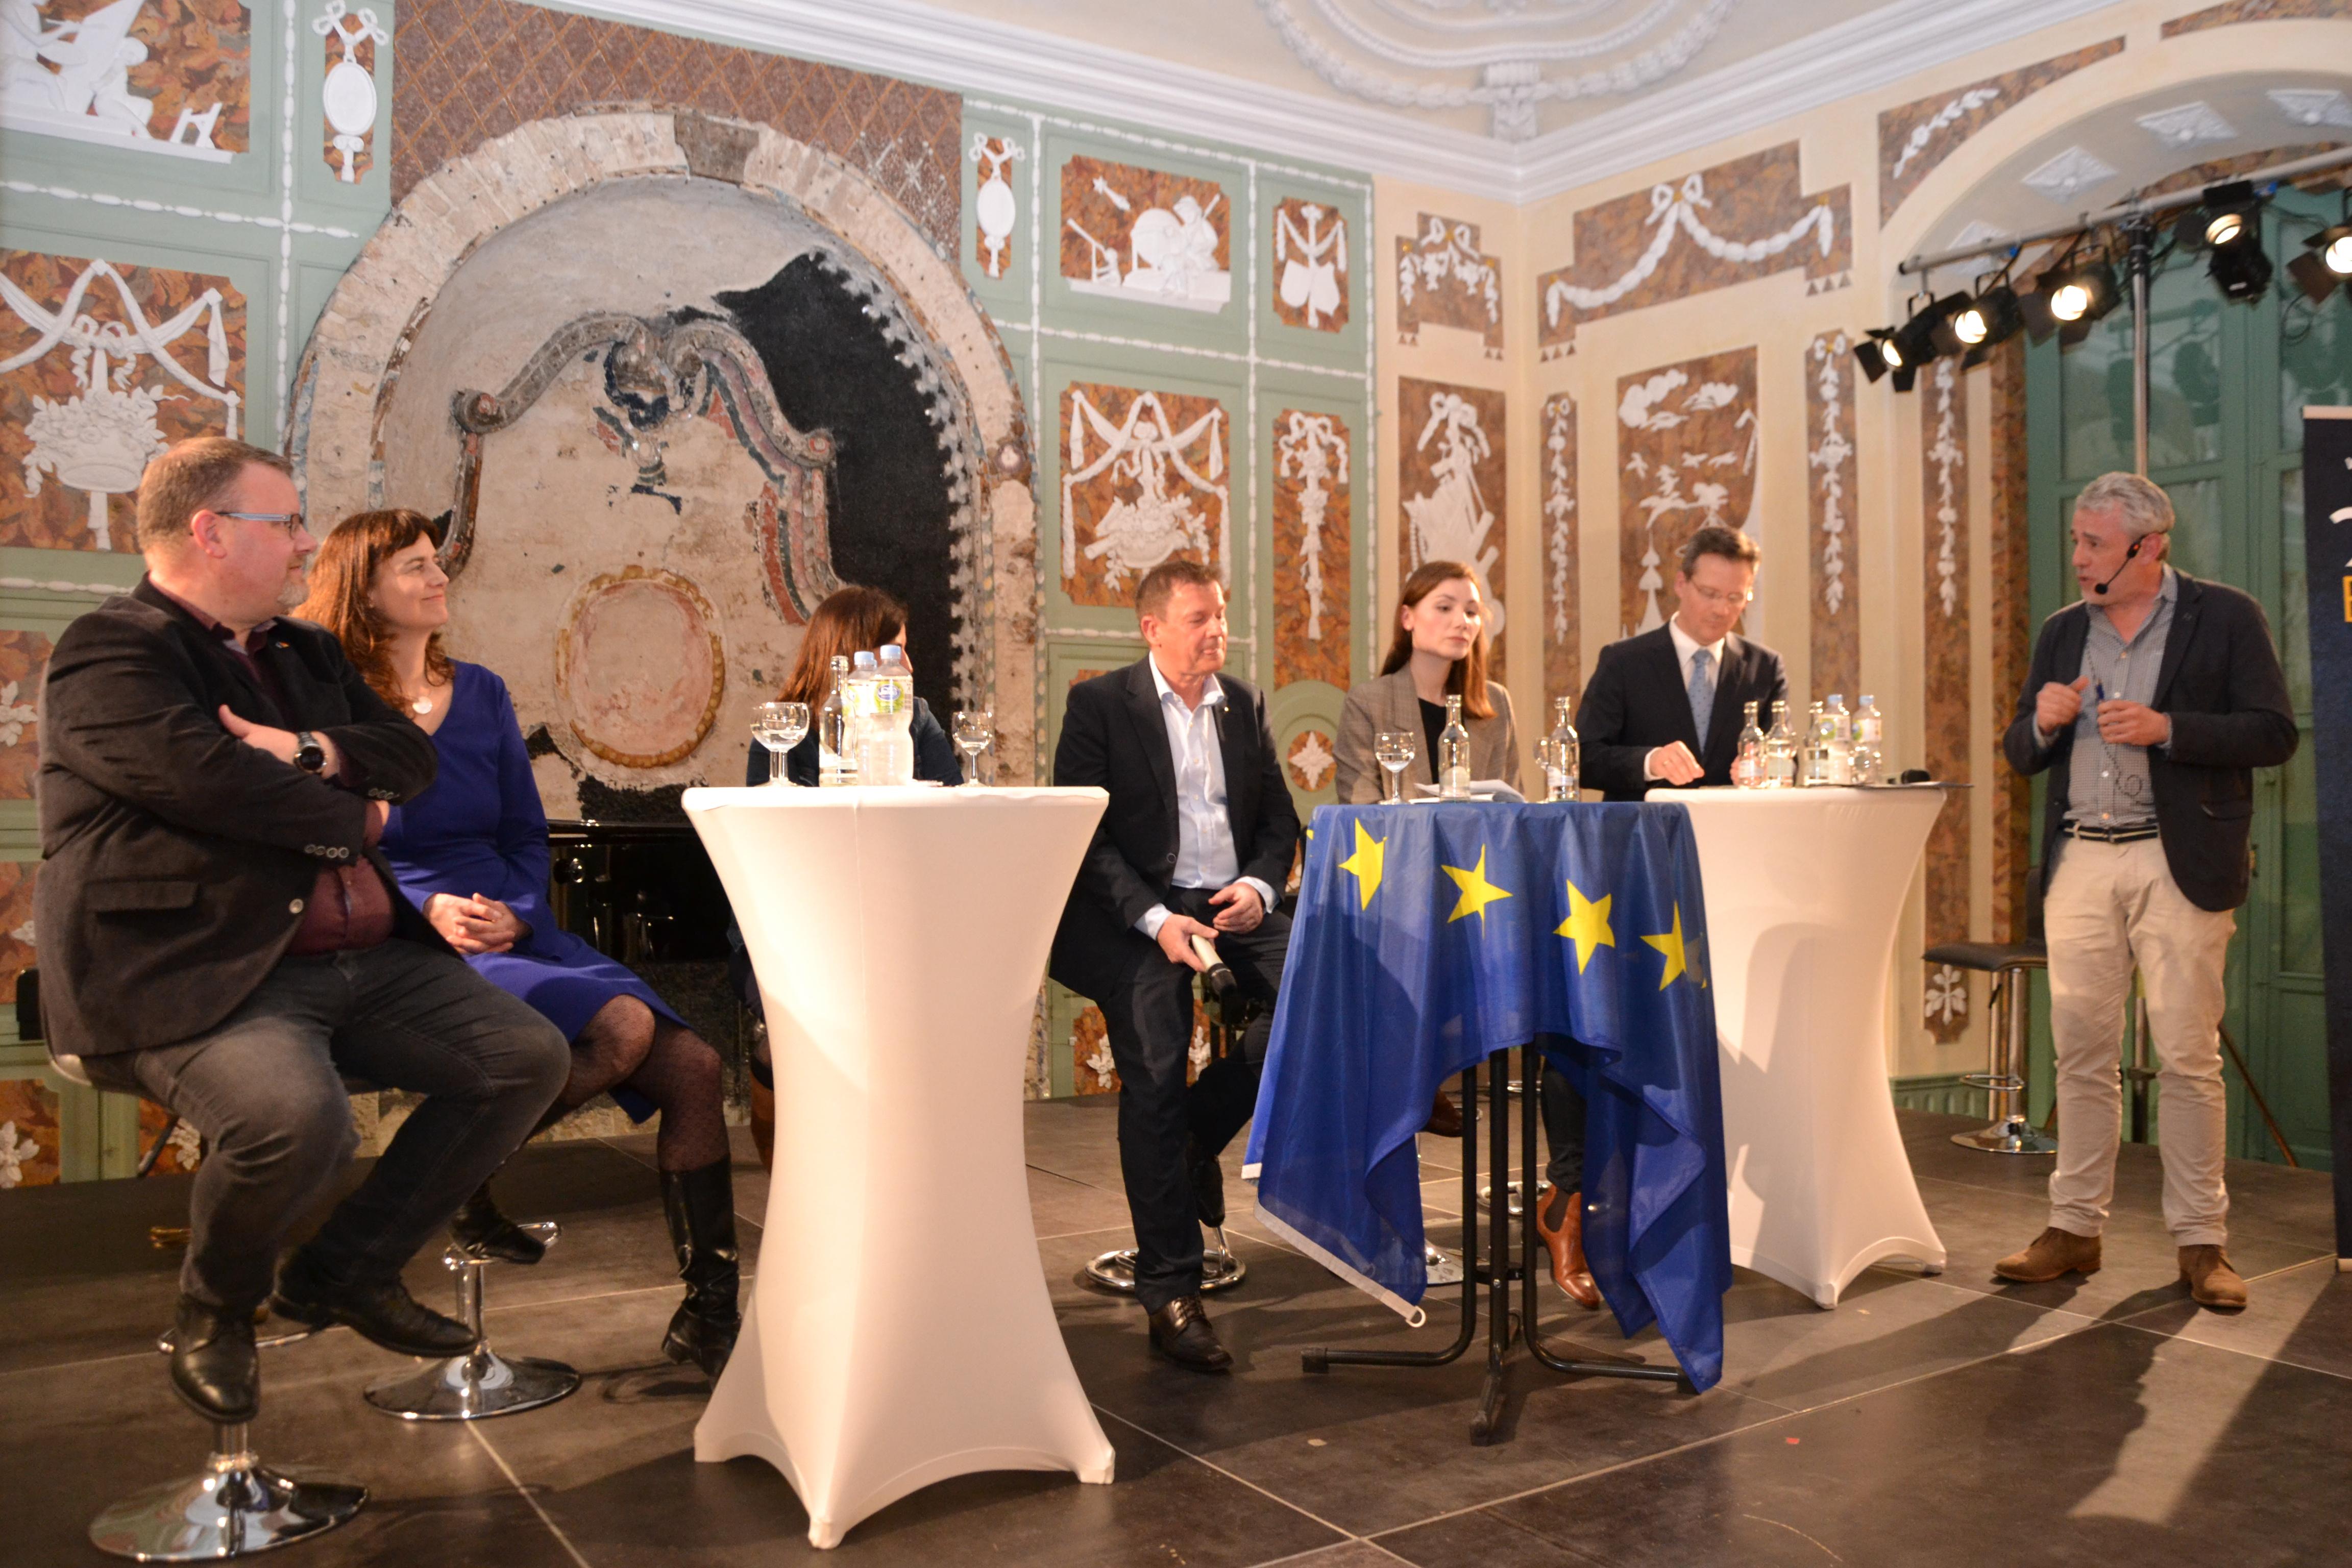 v.l. Gregor Schäfer (FDP), Alexandra Geese (Bündnis 90/Grüne), Özlem Demirel (Die Linke), Dr. Markus Pieper (CDU), Sarah Weiser (SPD), Martin Schiller (AfD), und Moderator Prof. Dr. Thilo Harth